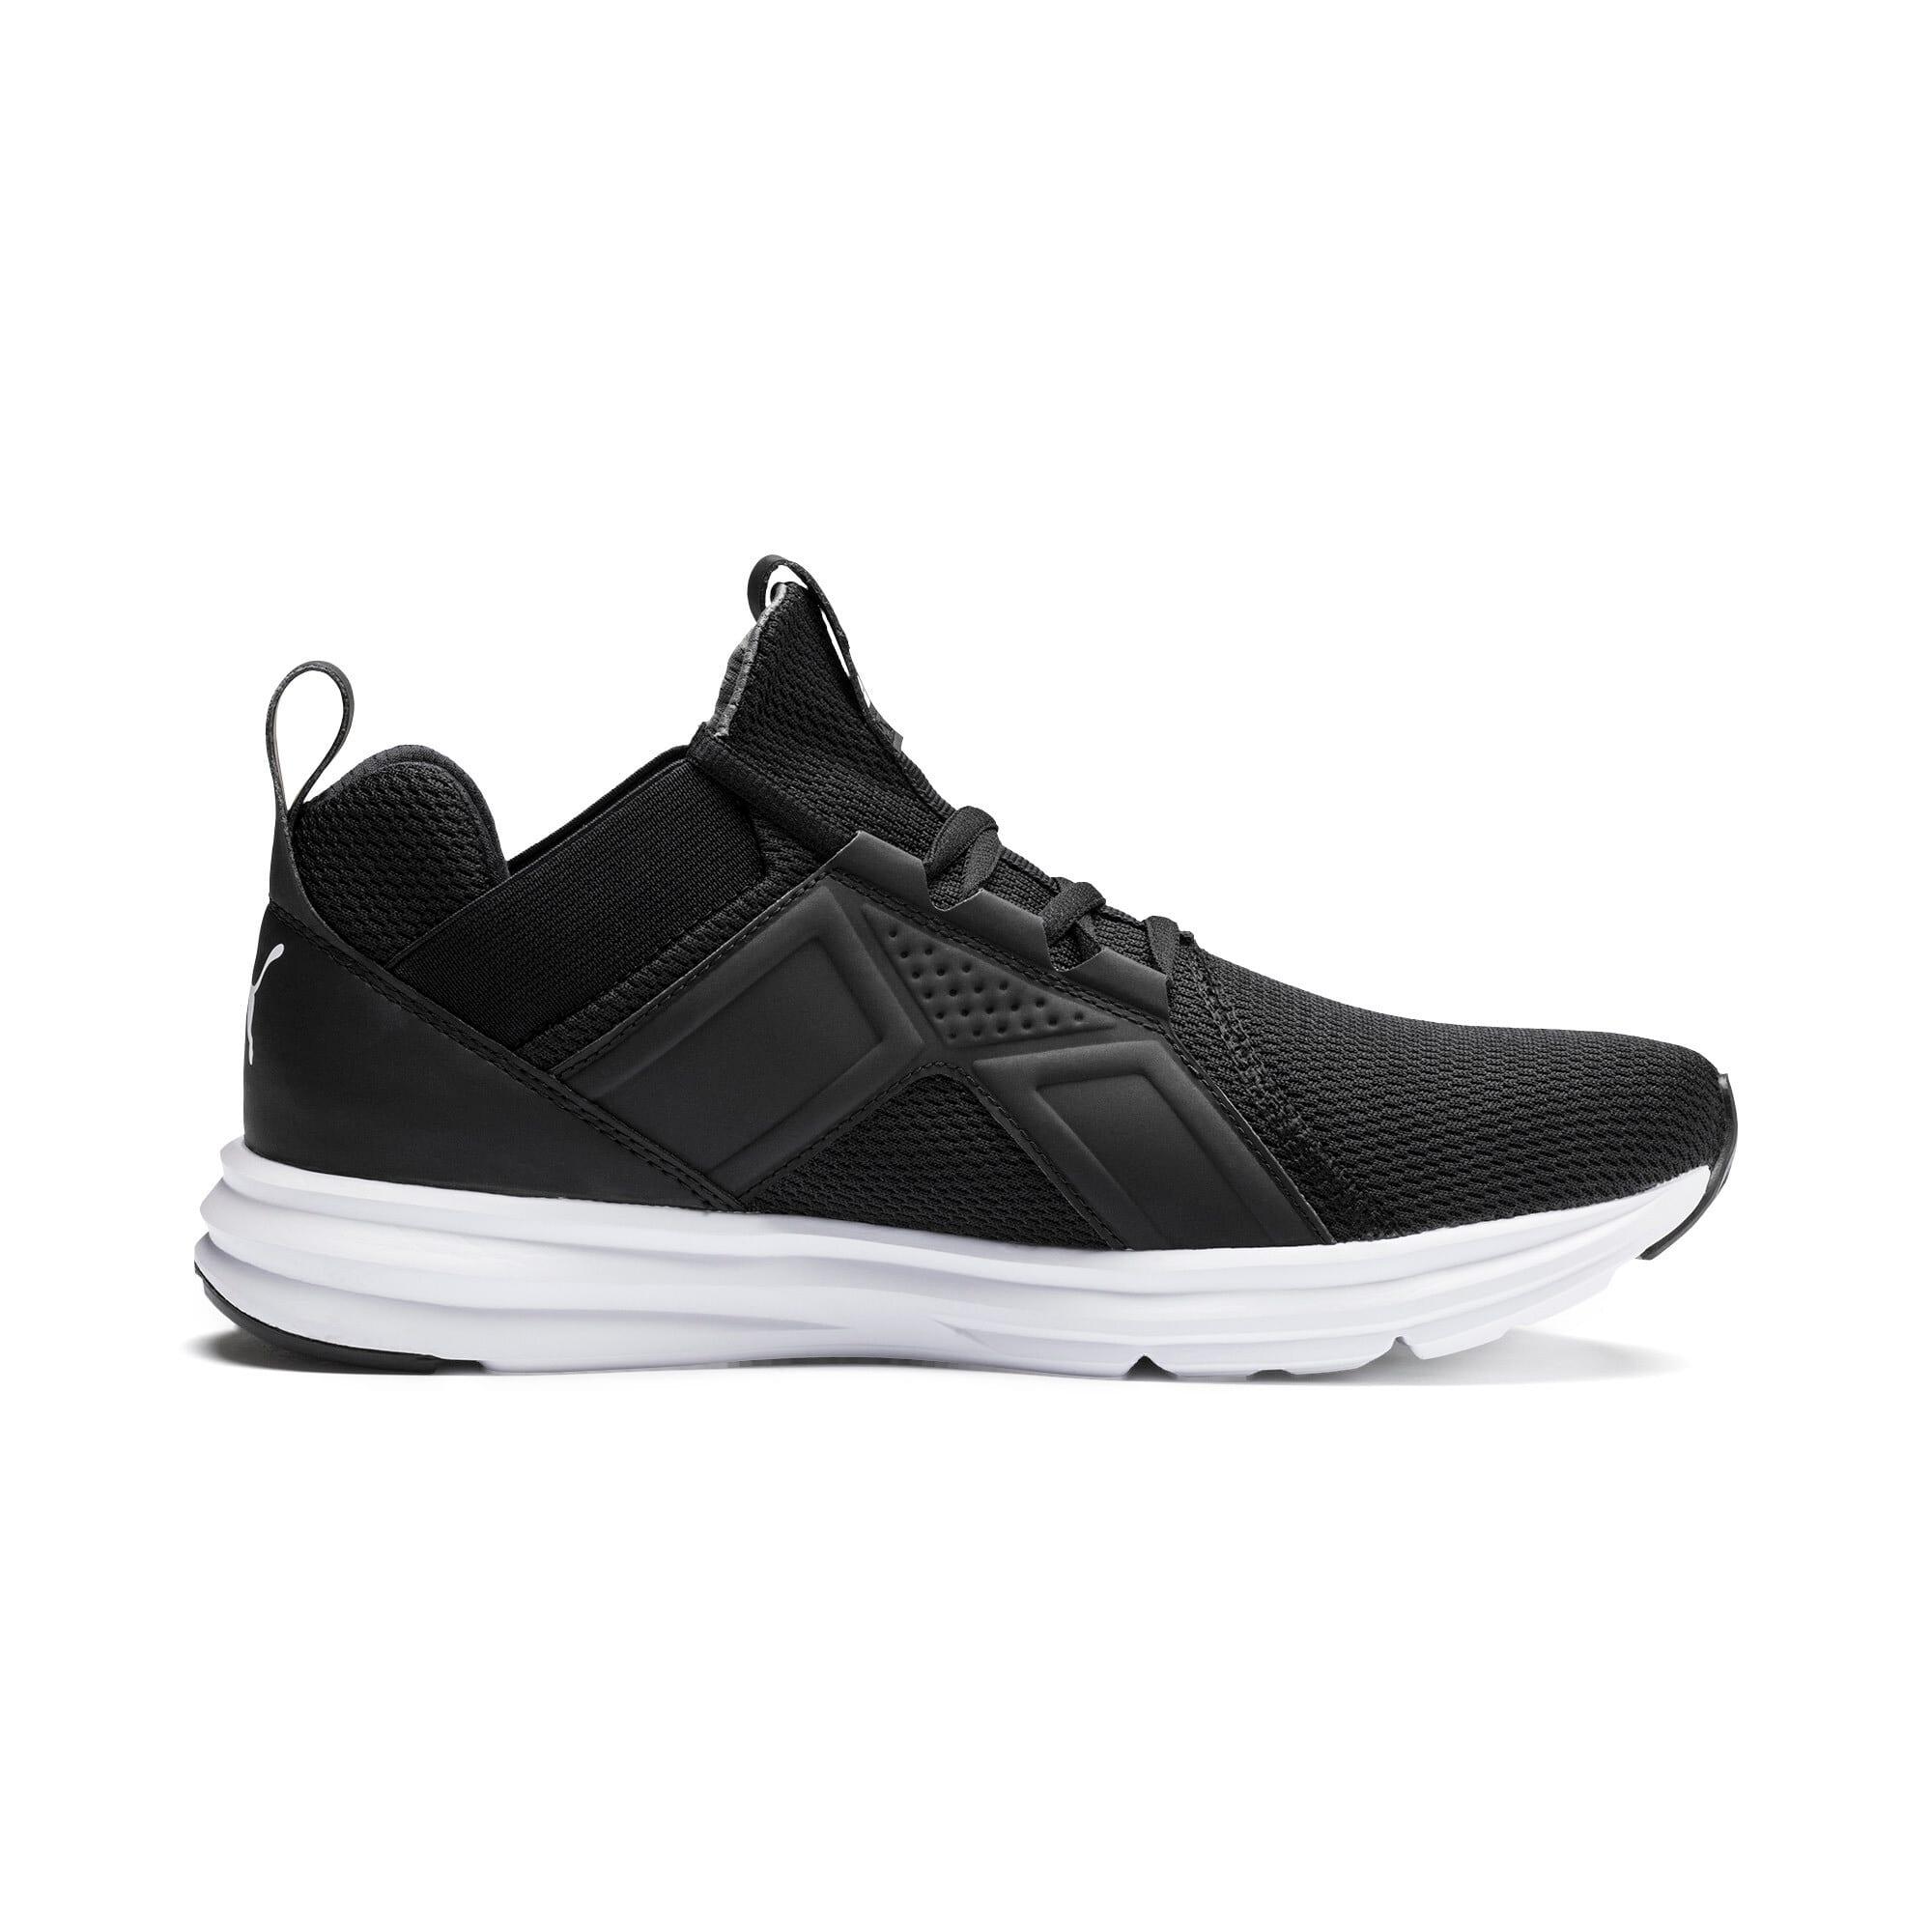 Thumbnail 6 of Enzo Sport Herren Sneaker, Puma Black-Puma White, medium